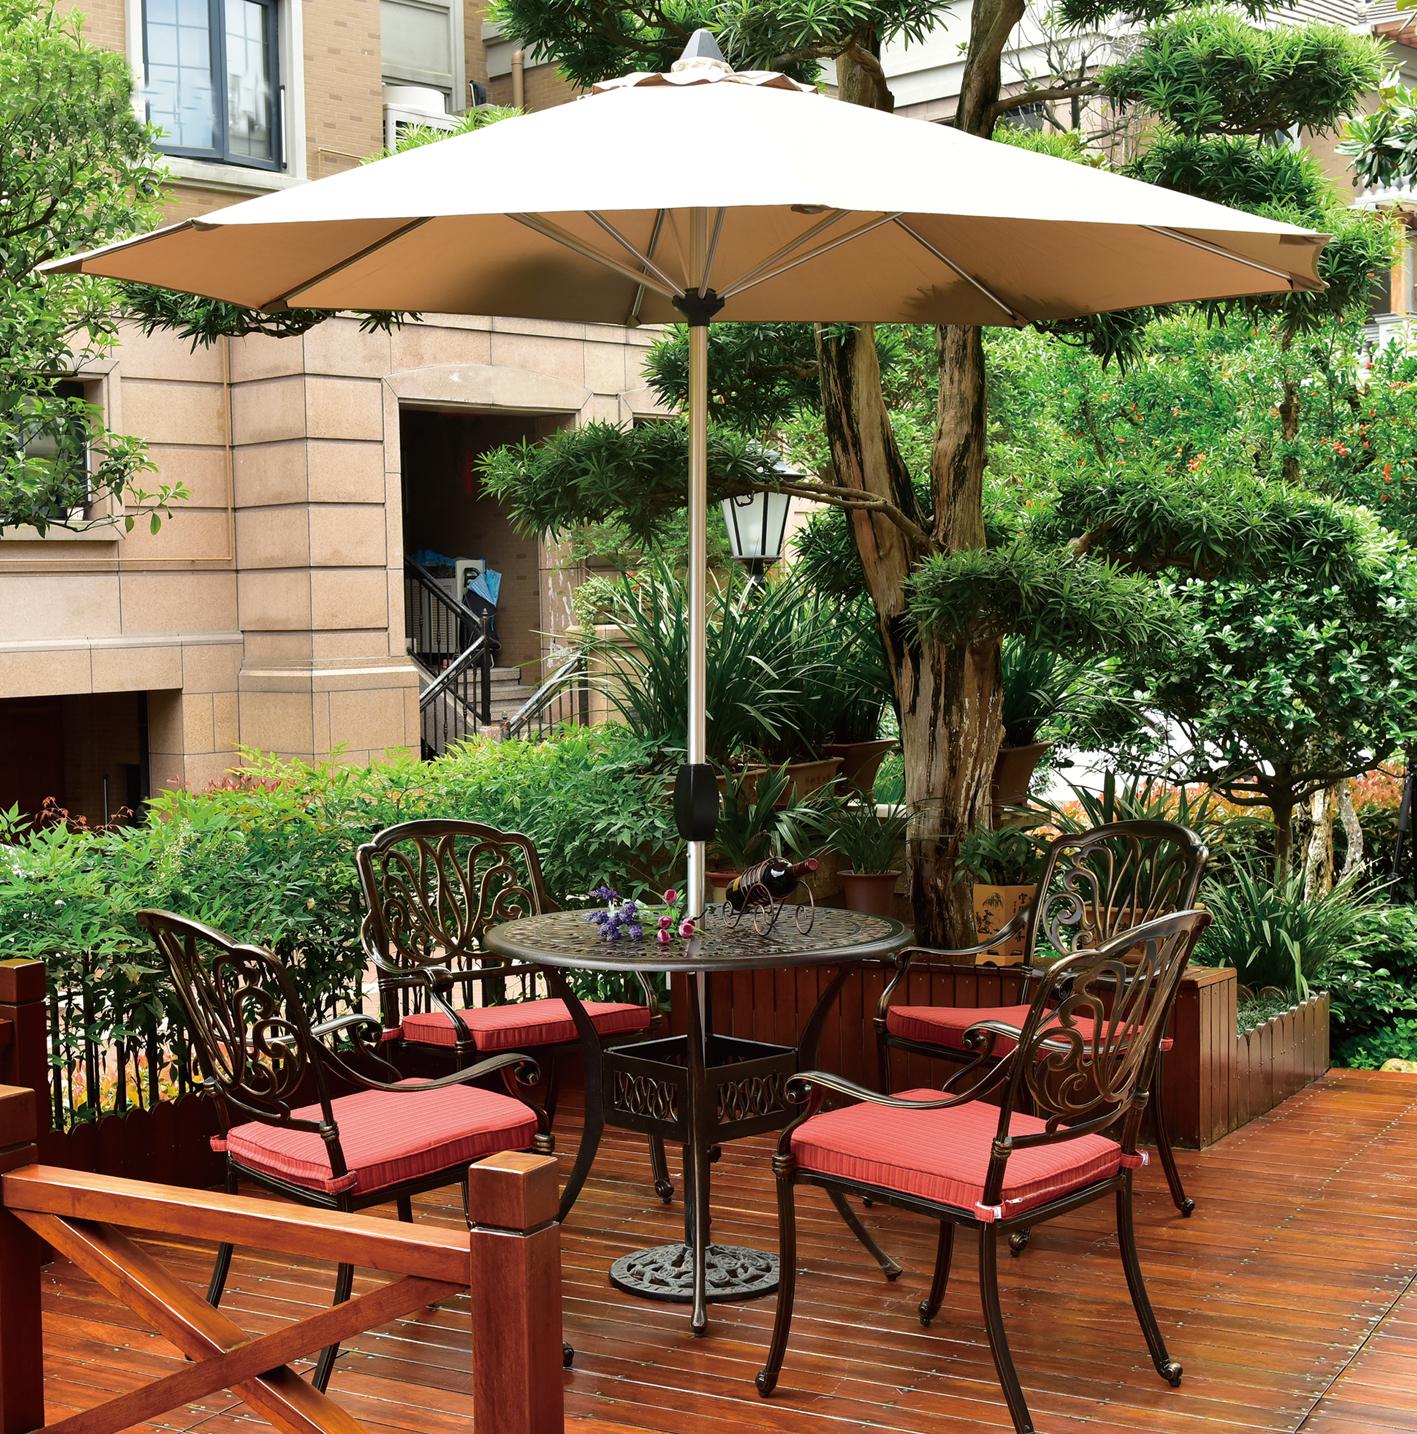 jdm 5pc bronze modern aluminum outdoor furniture front porch furniture jdm supply garden. Black Bedroom Furniture Sets. Home Design Ideas